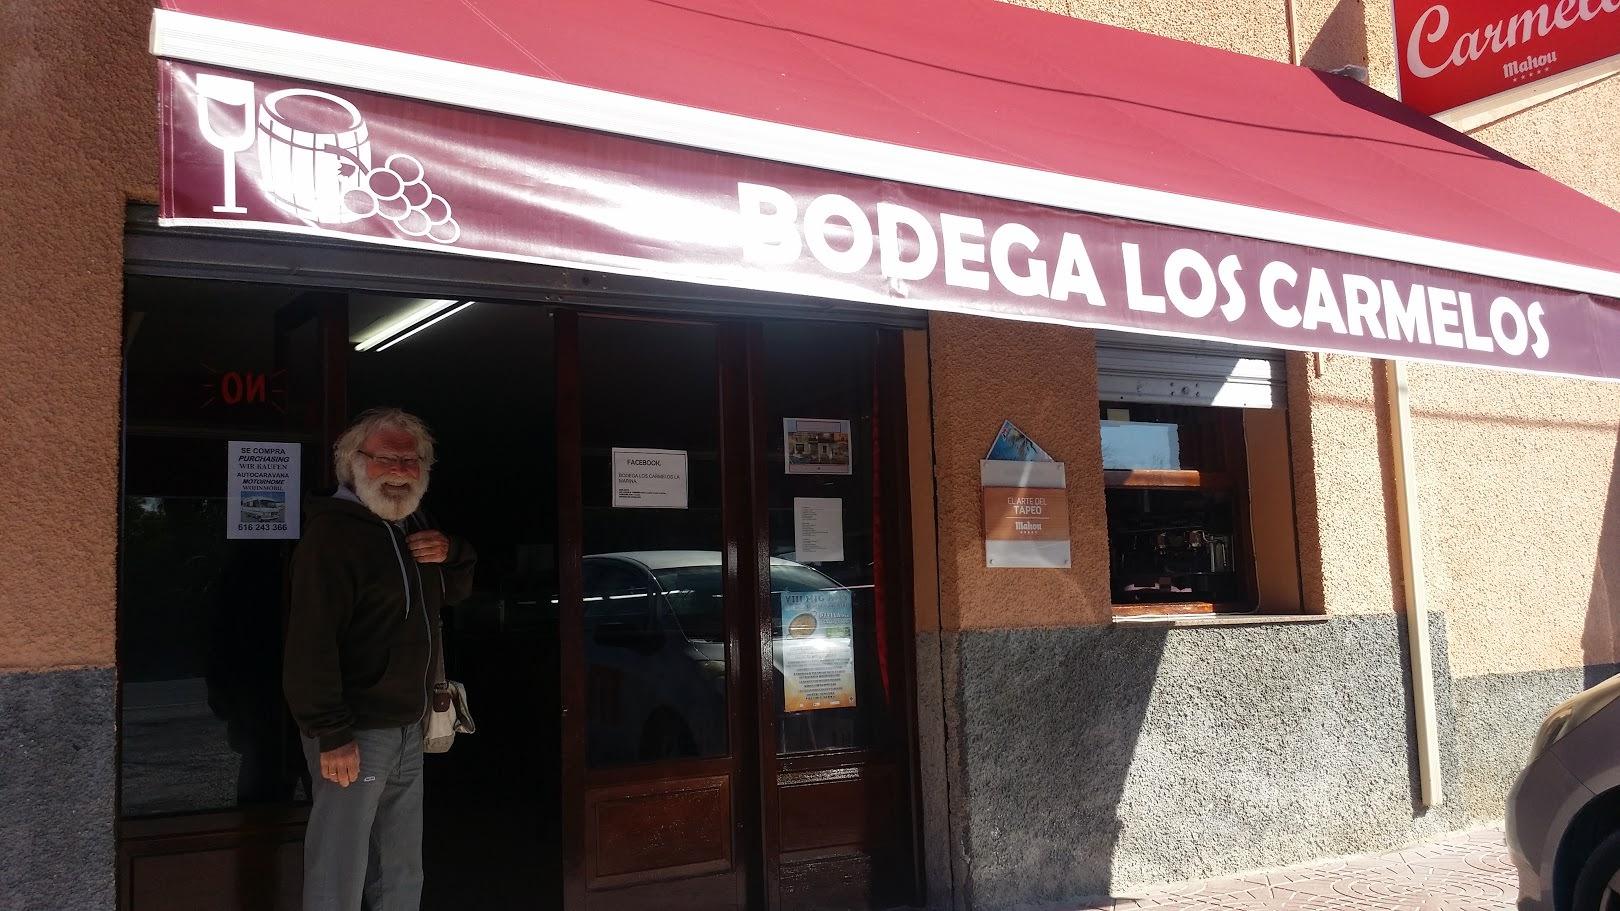 Bodega Los Carmelos